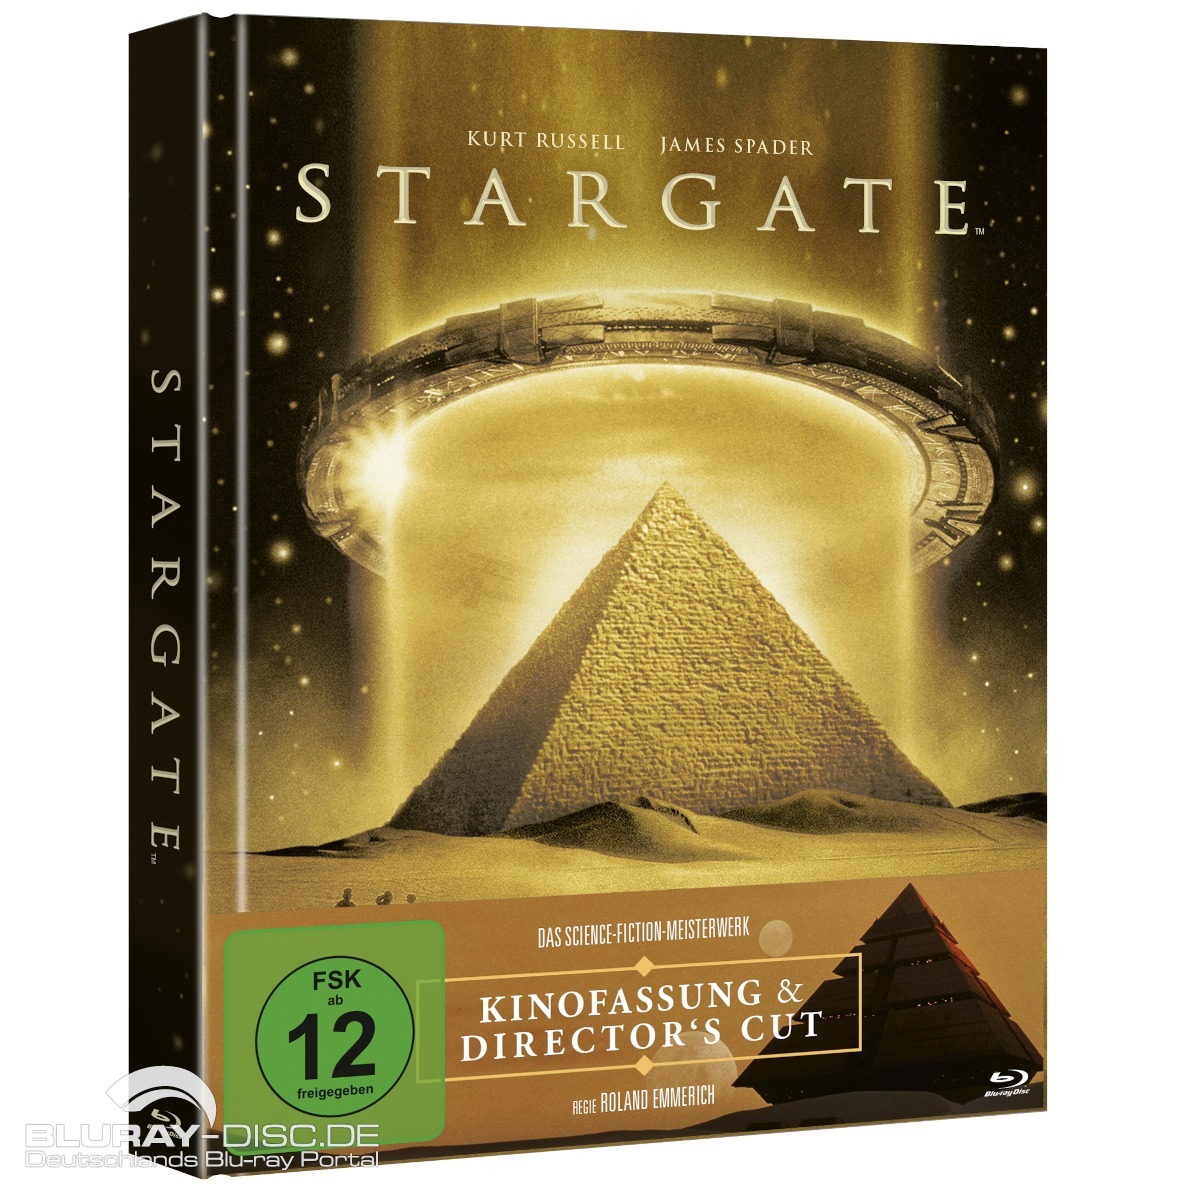 Stargate_Galerie_Mediabook_Cover_B.jpg